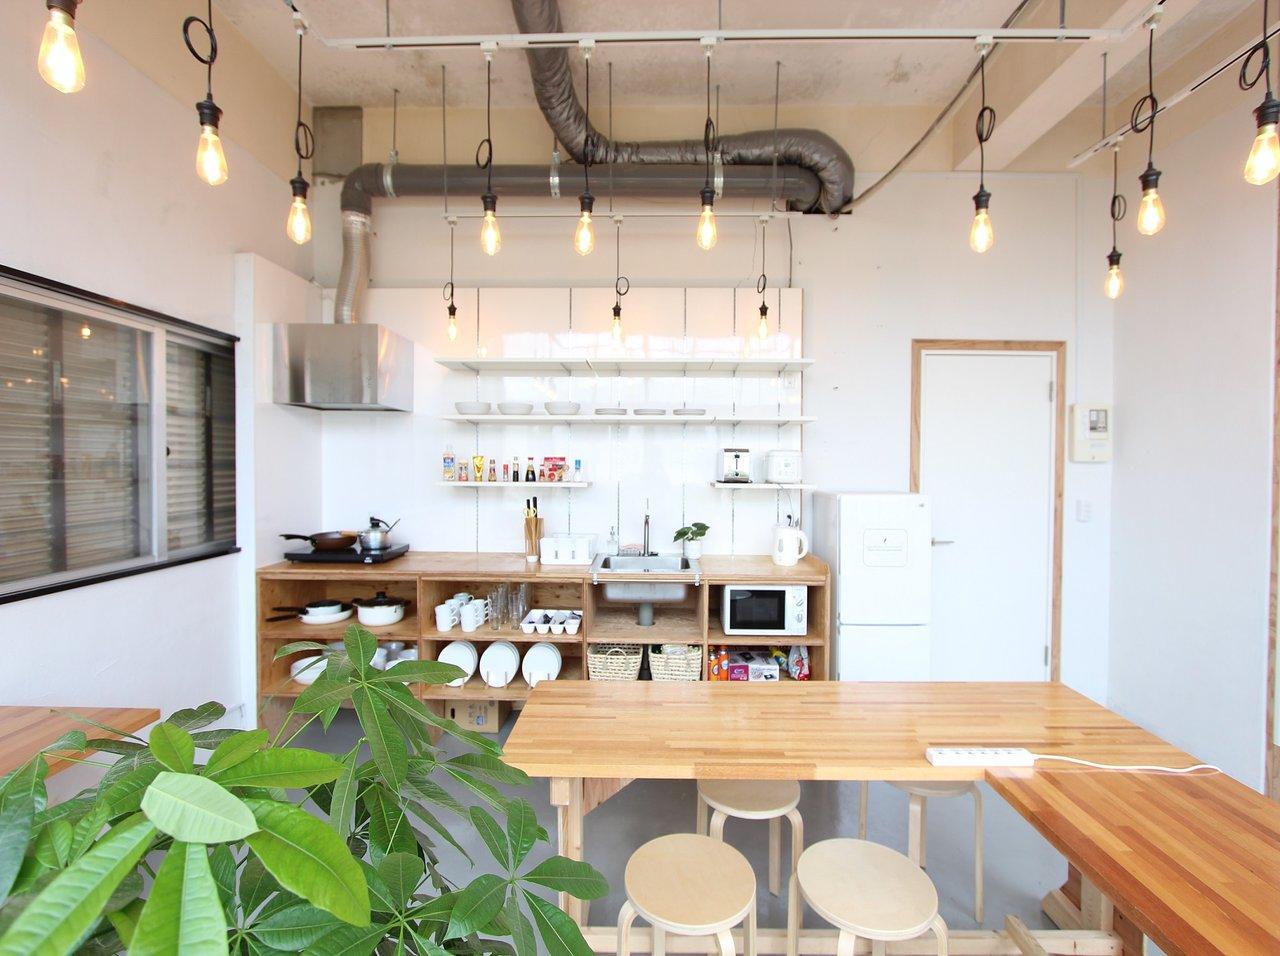 Ishigaki Guesthouse Hive 33 5 7 Prices Japanese